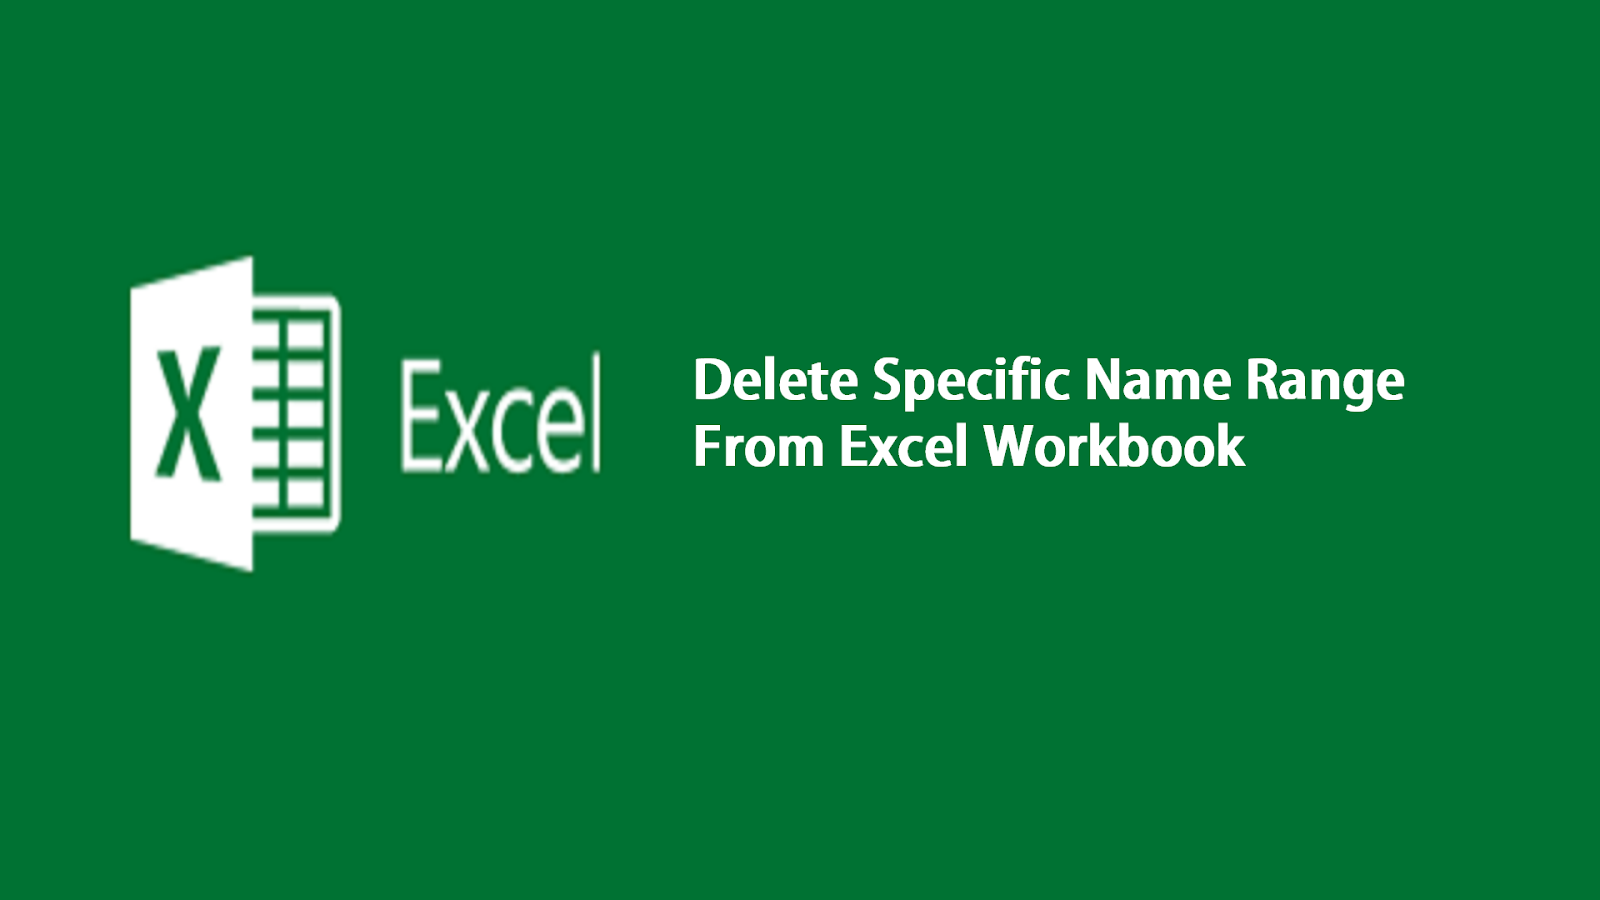 Vba Tricks And Tips Excel Vba Macro To Delete Specific